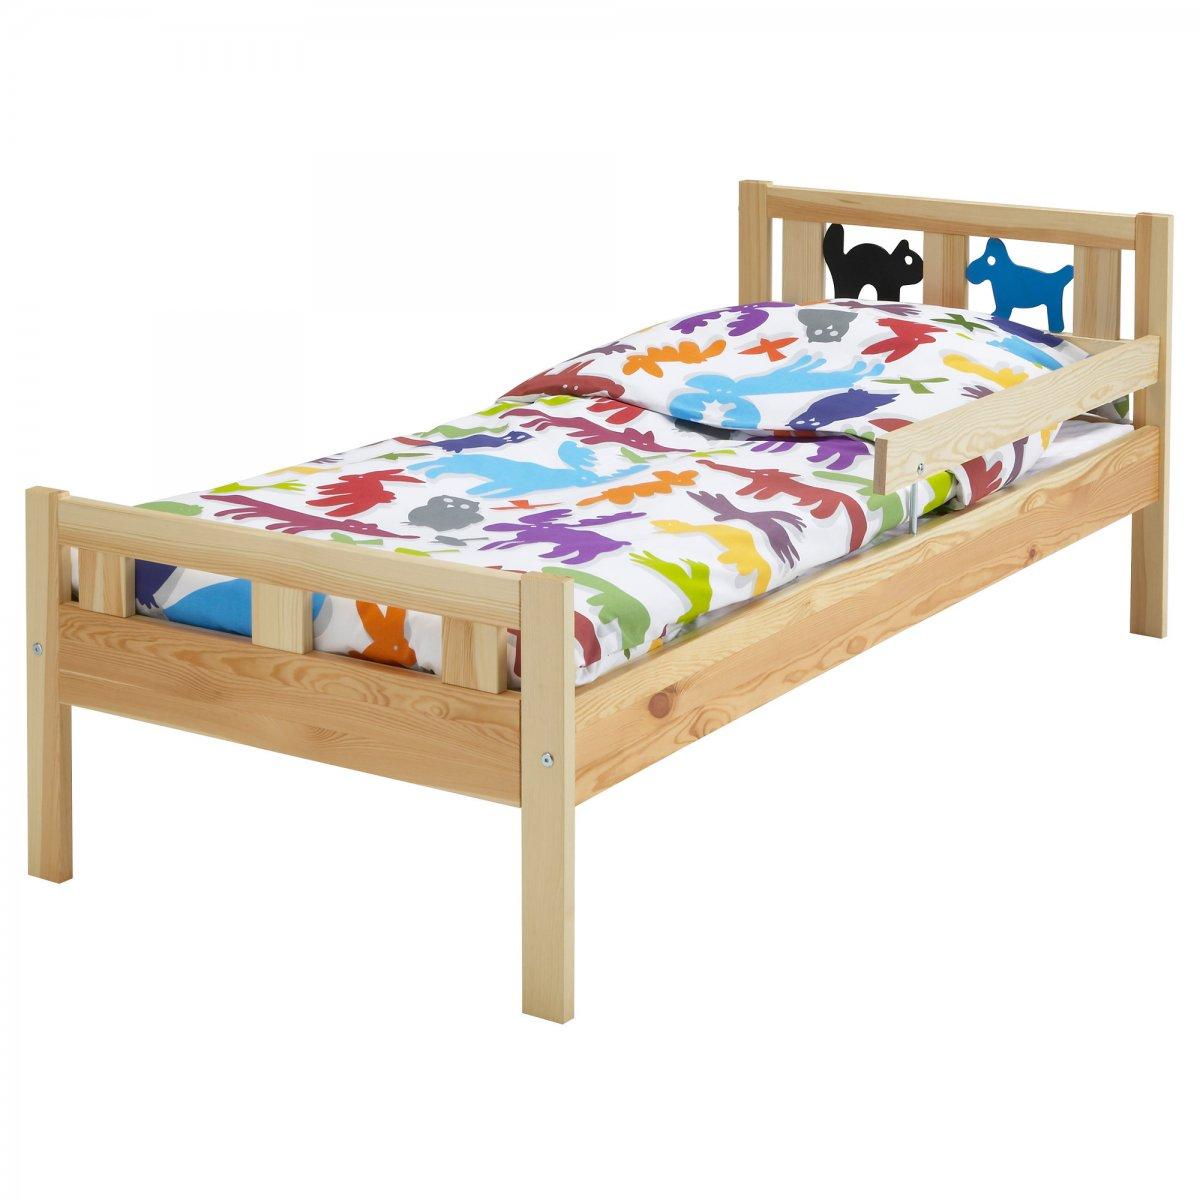 Mobiliario para ni os kritter de ikea decoraci n del hogar - Camas muebles en ikea ...